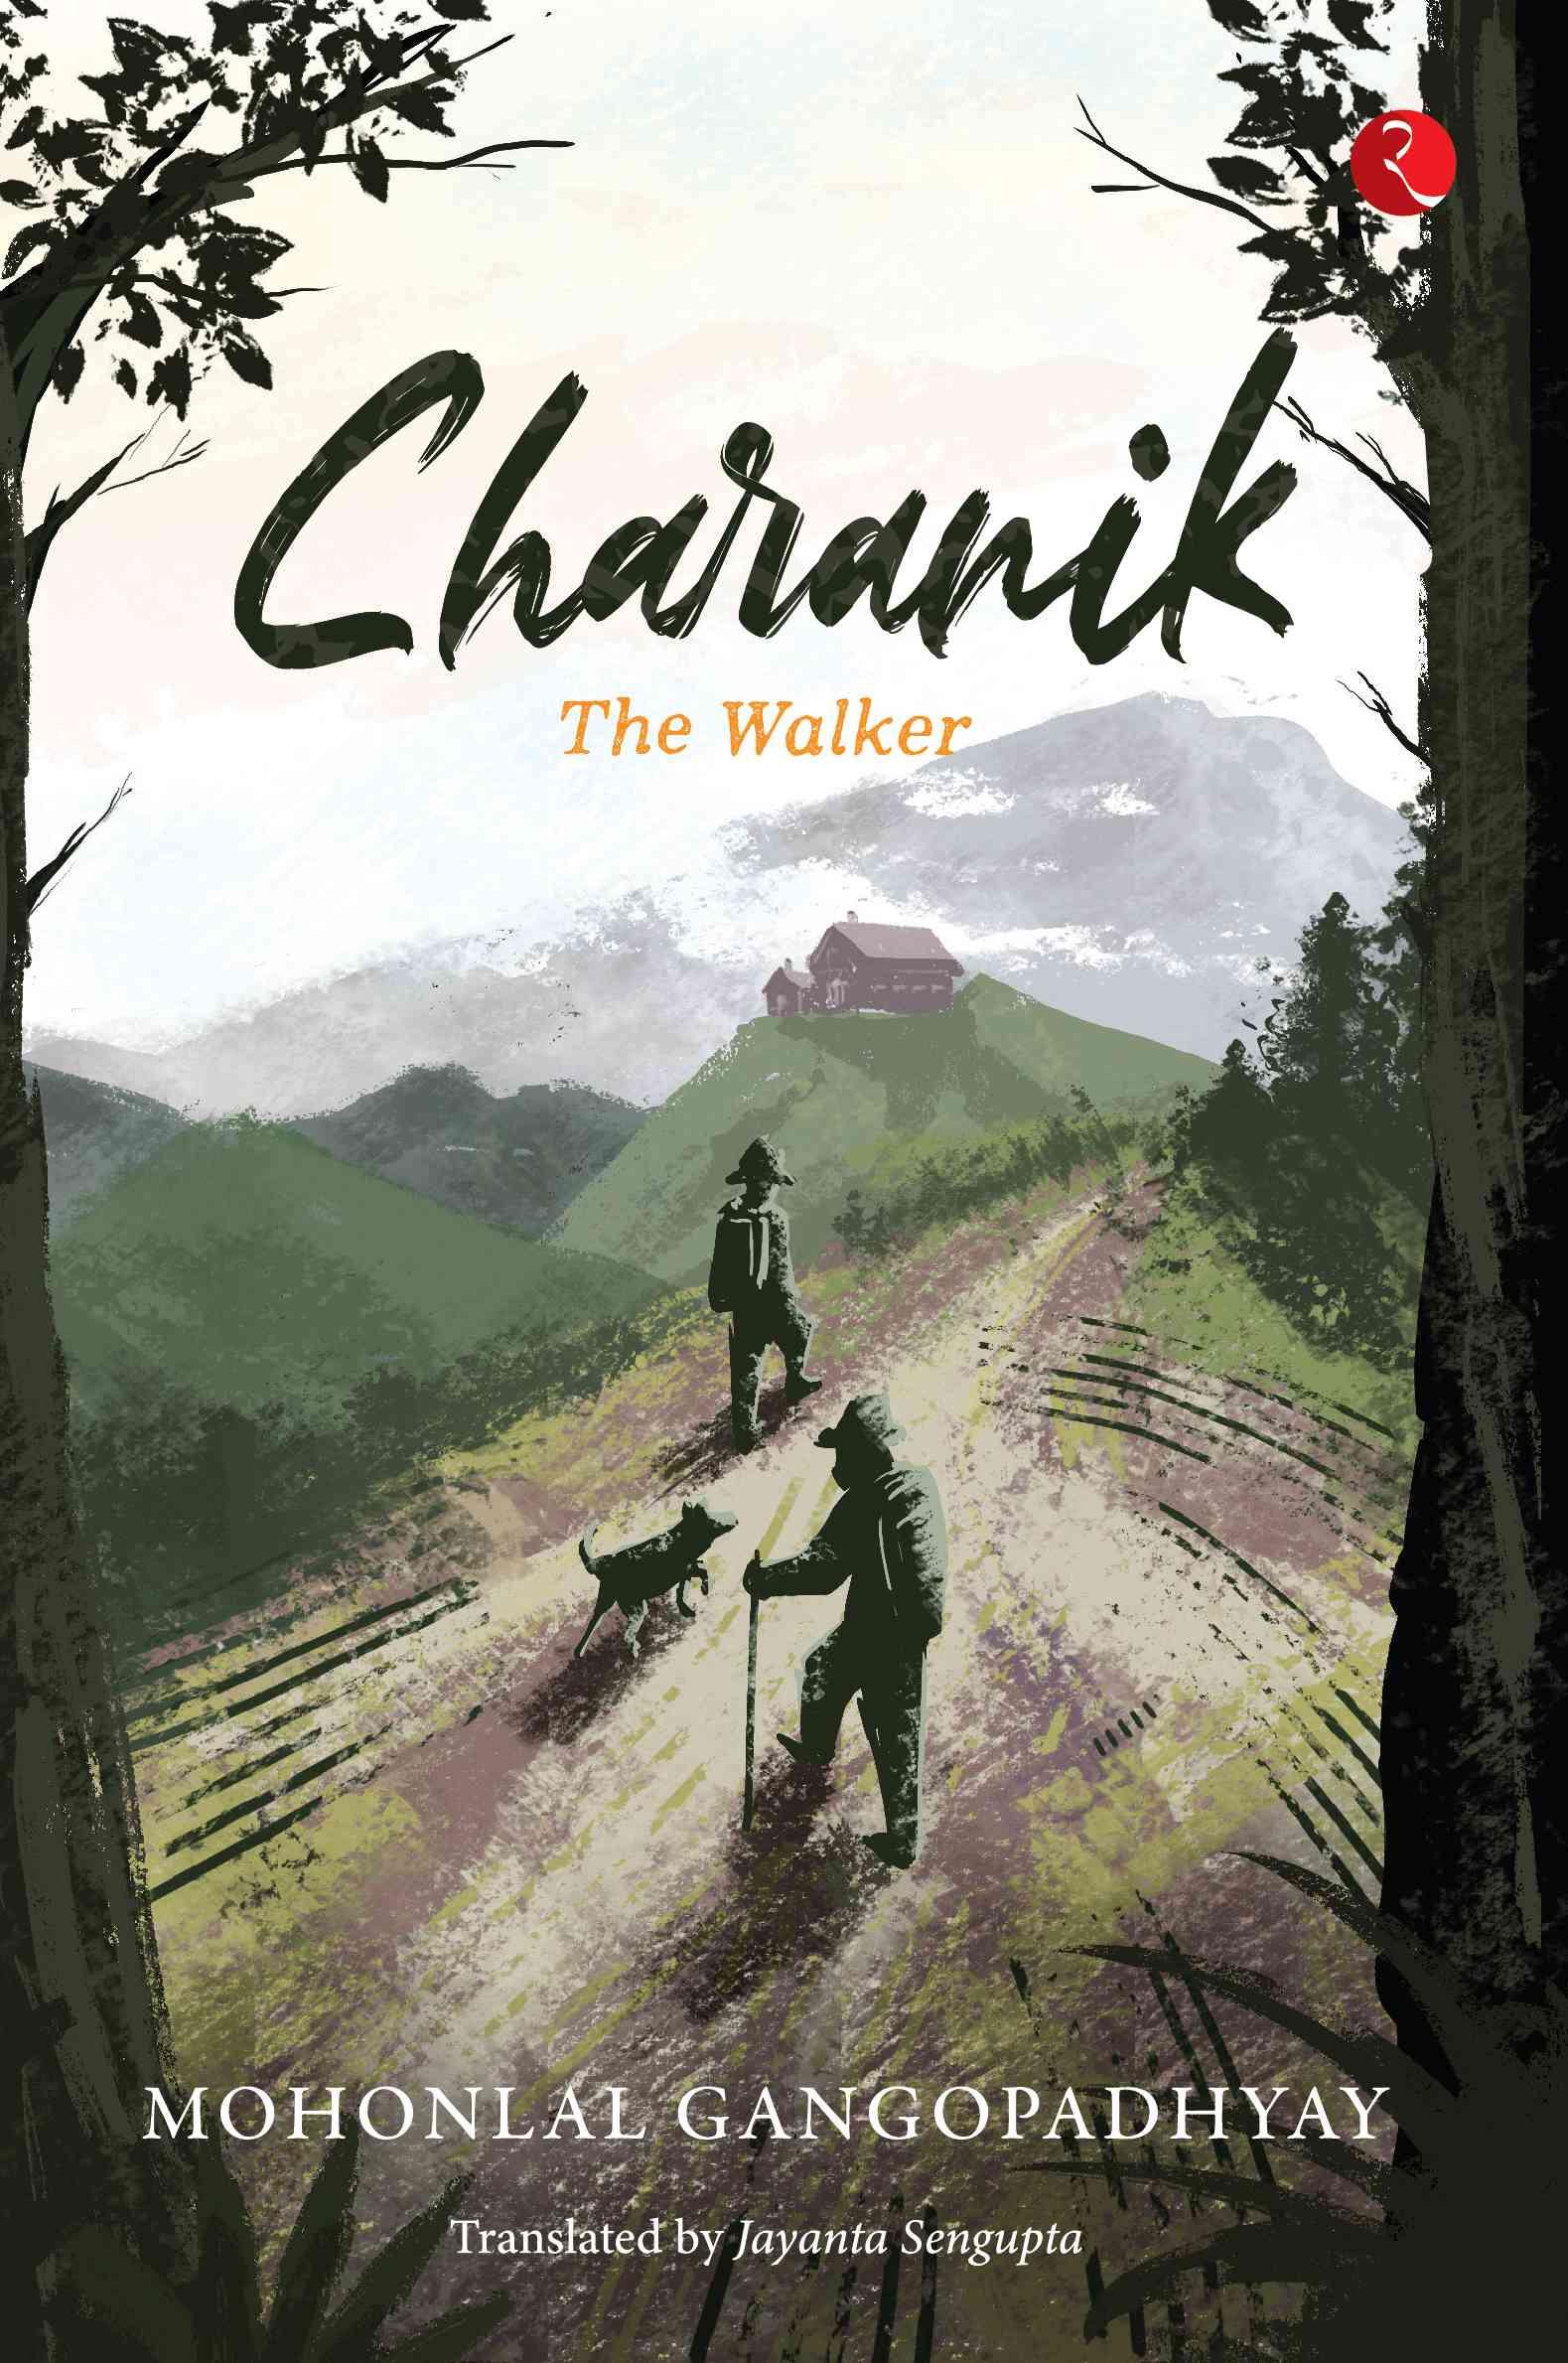 Charanik: The Walker